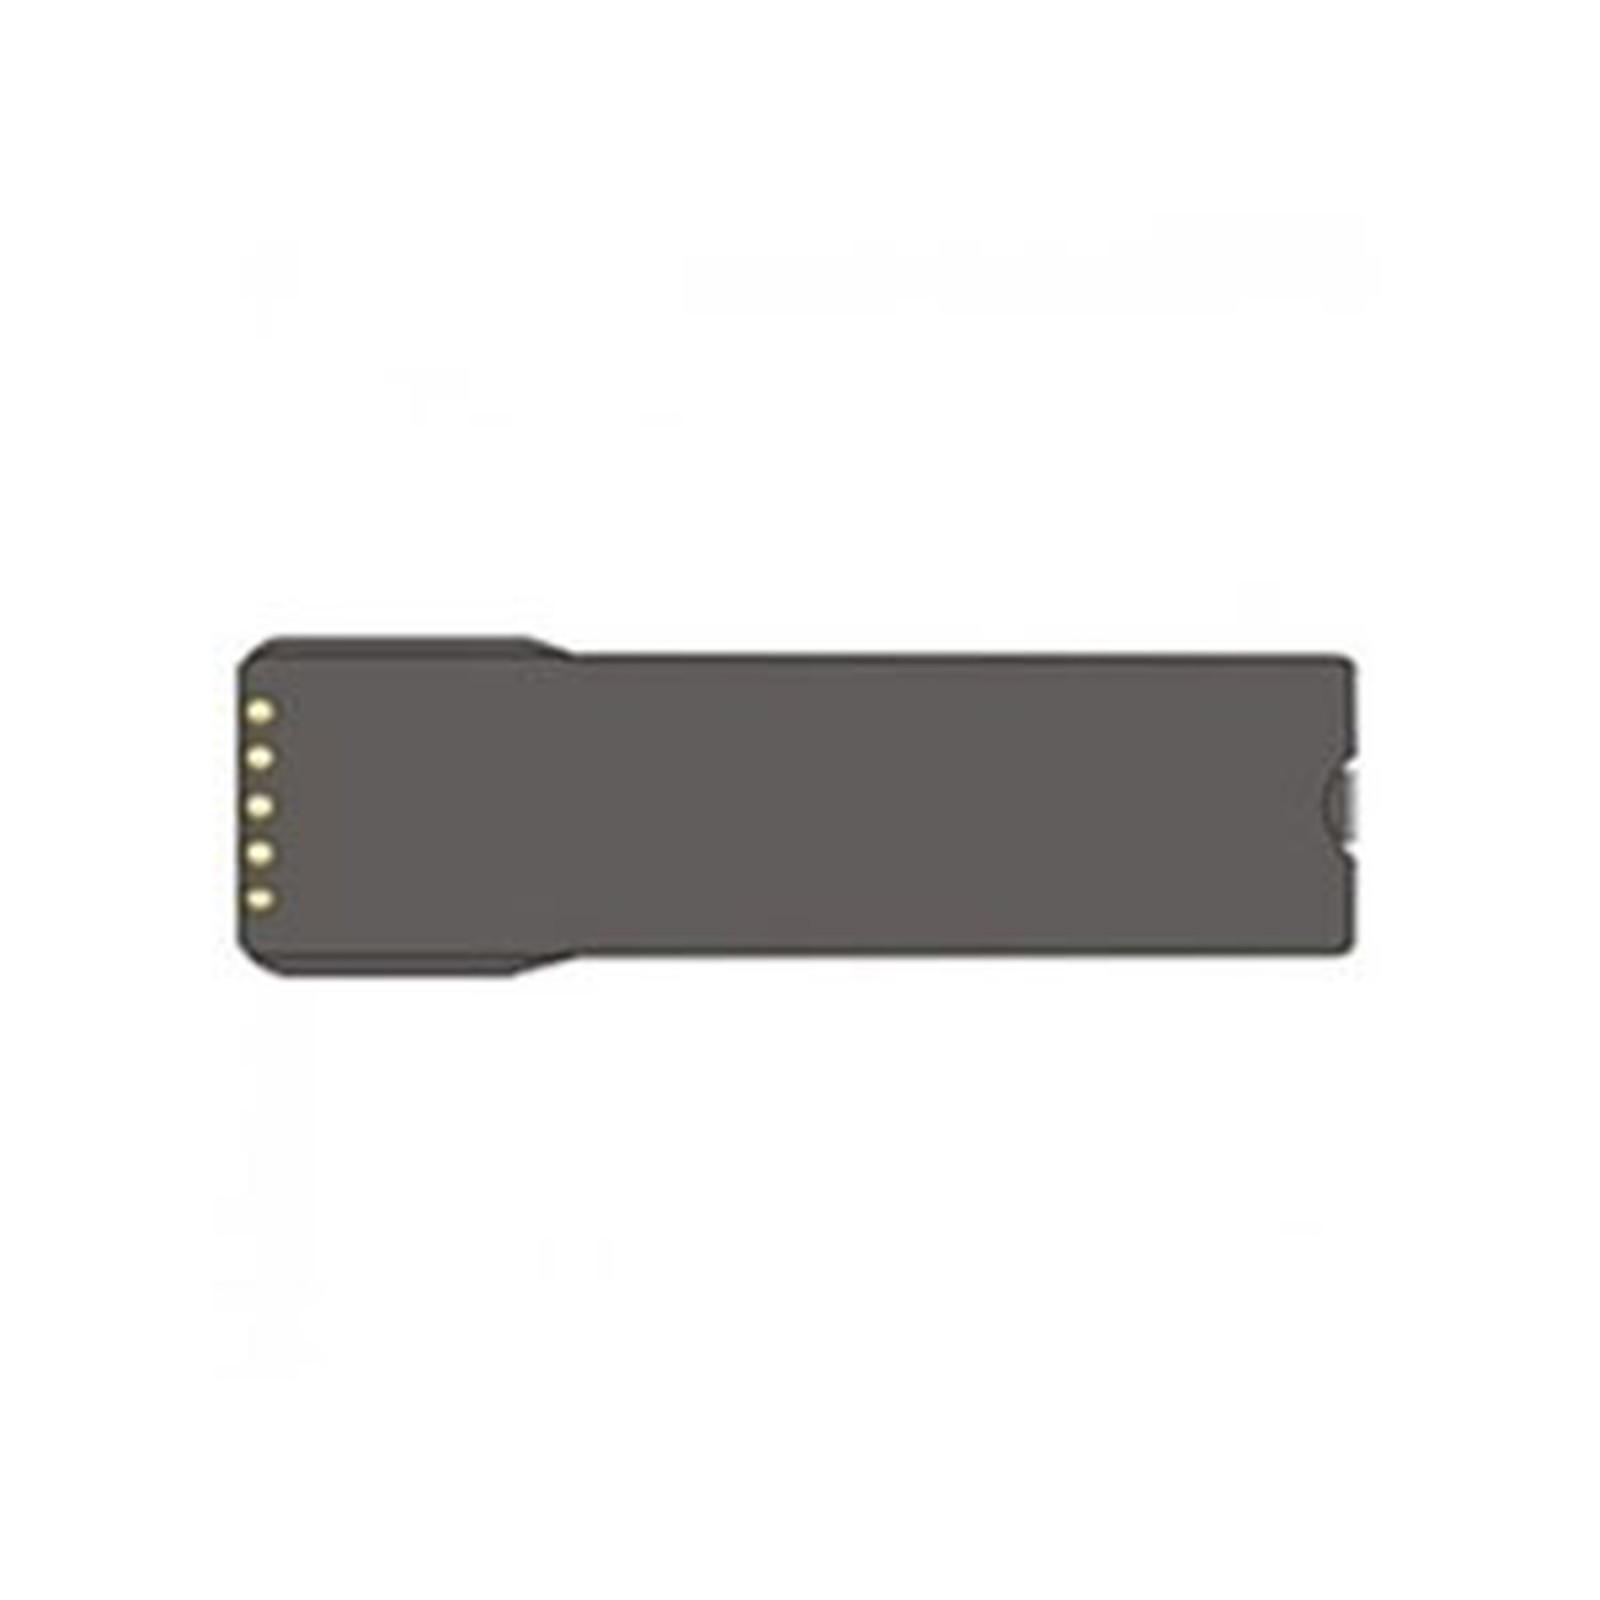 Honeywell Batterie Standard rechargeable